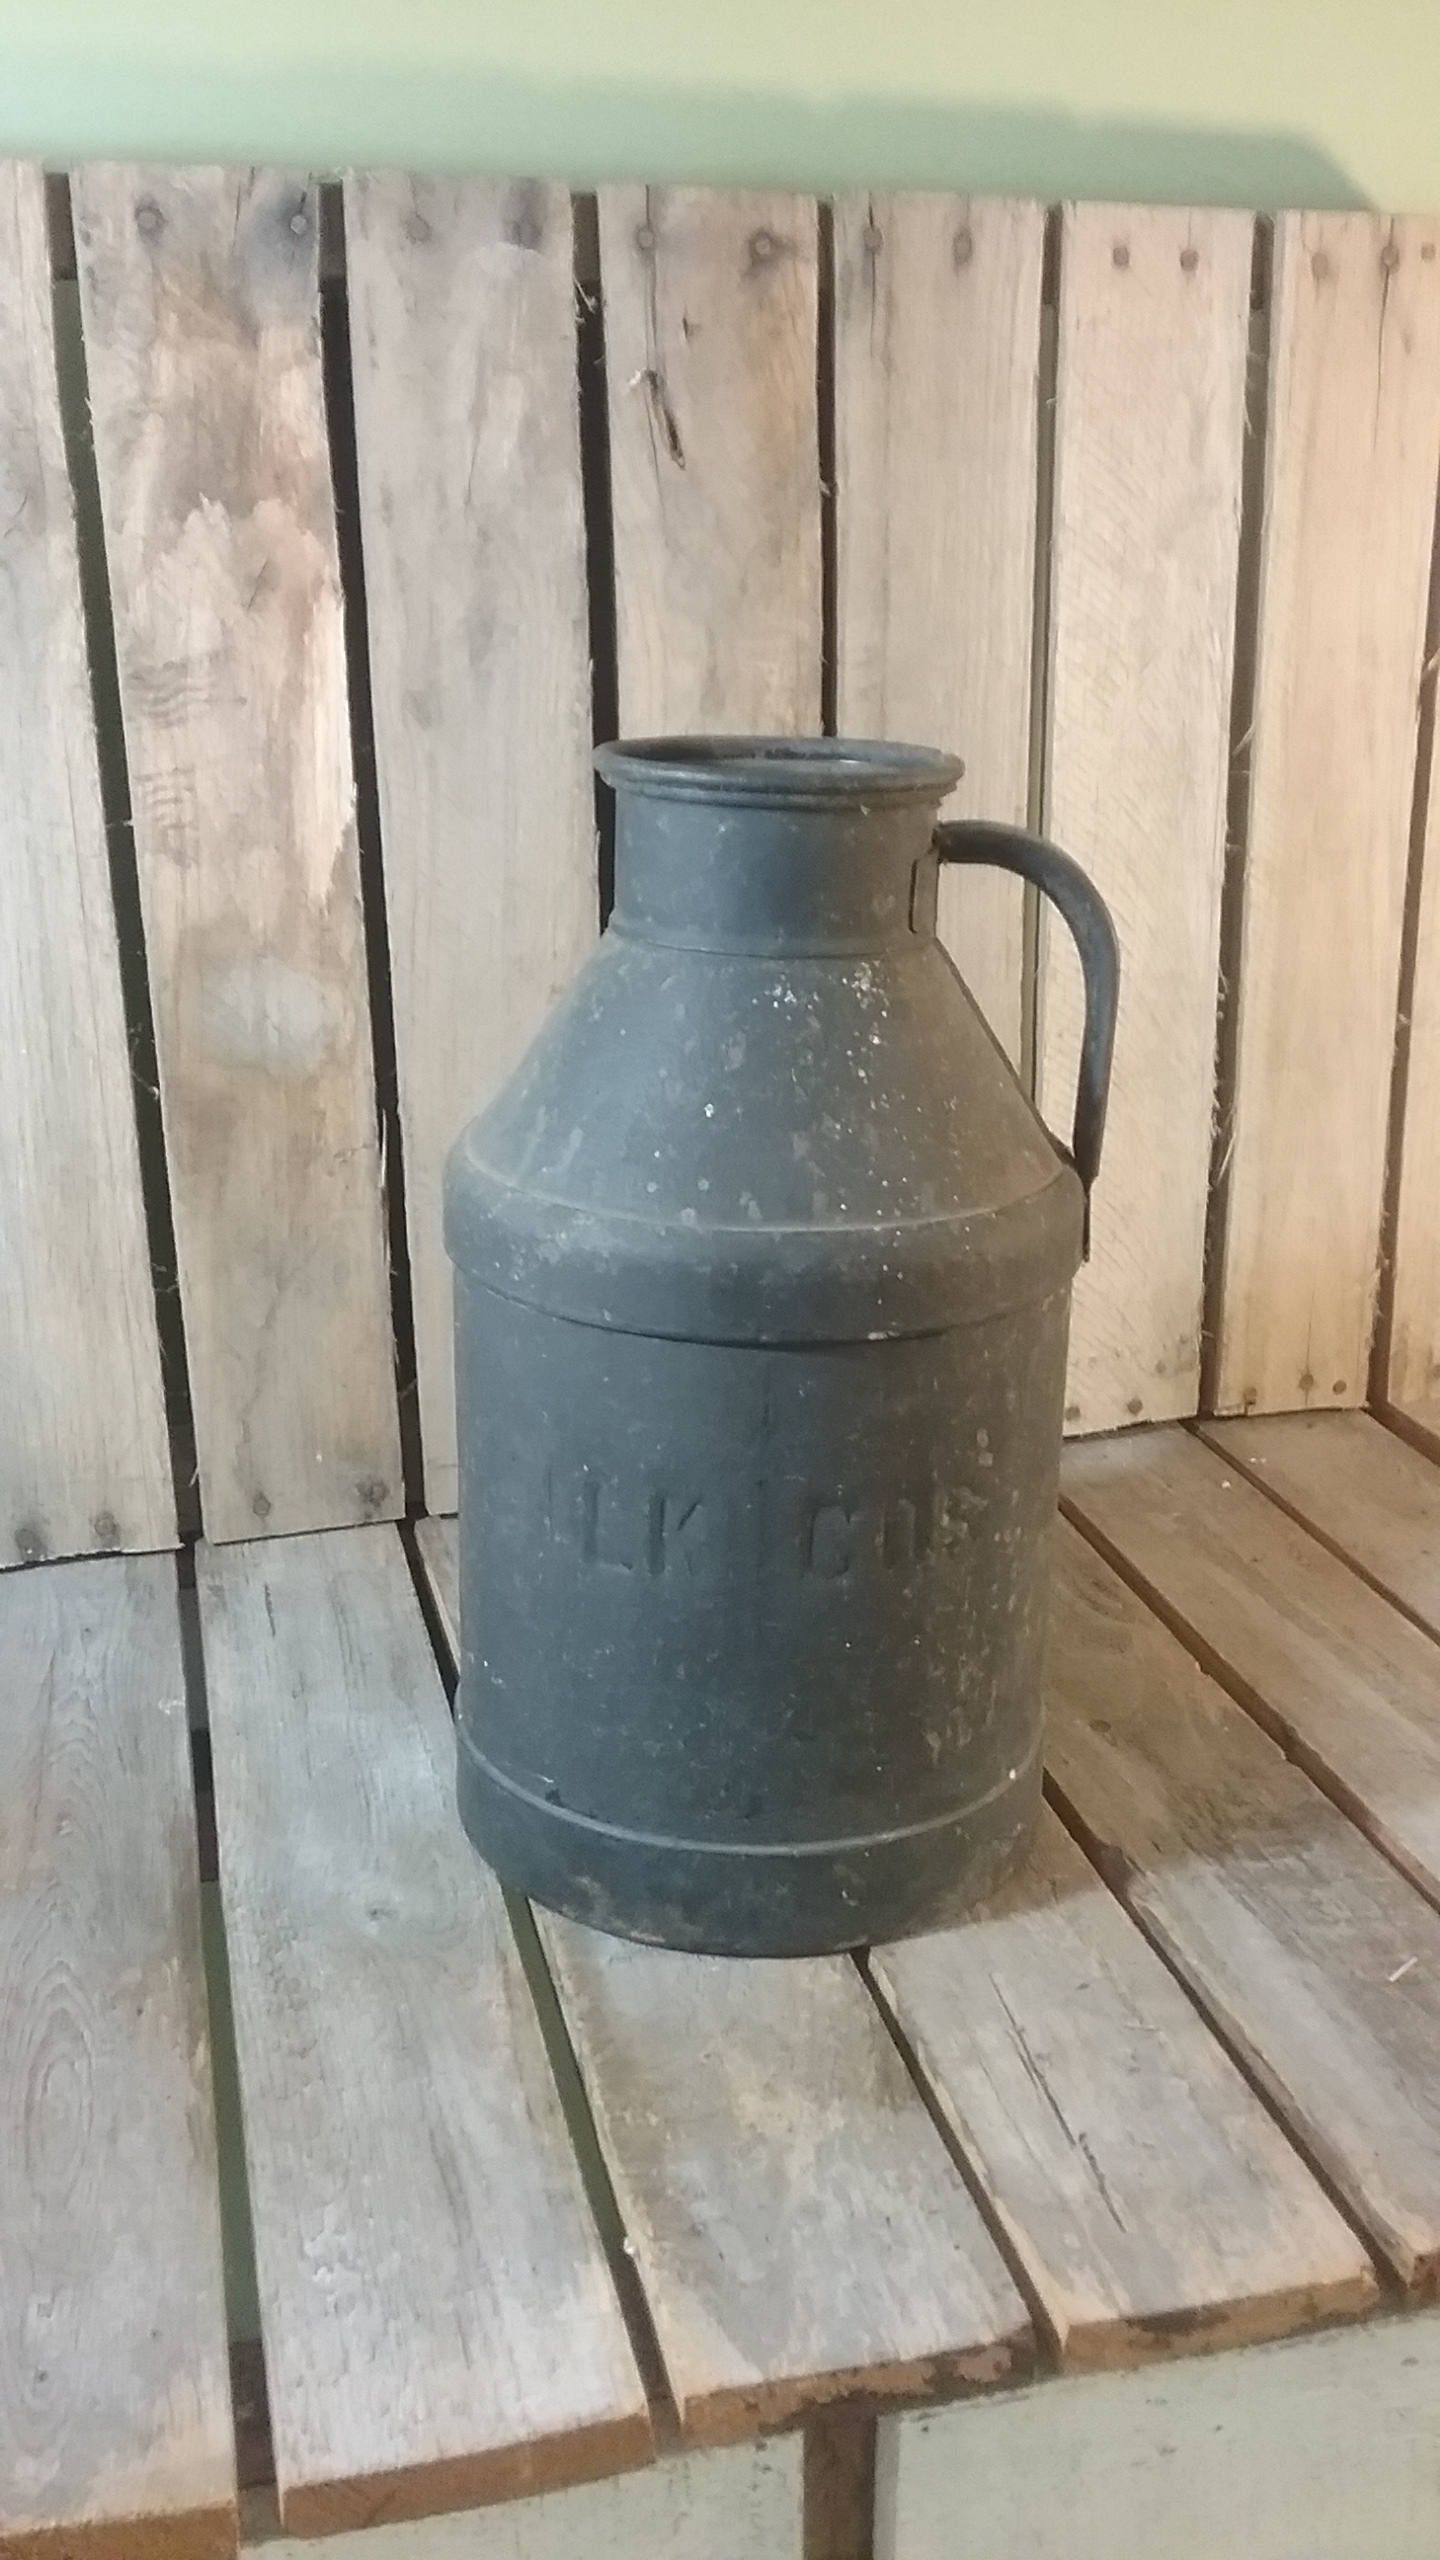 Metal Milk Jug Antique Milk Can Old Milk Can Vintage Milk Jug Farm Can Whites Milk Can Old Milk Jug Small M Antique Milk Can Old Milk Jugs Old Milk Cans